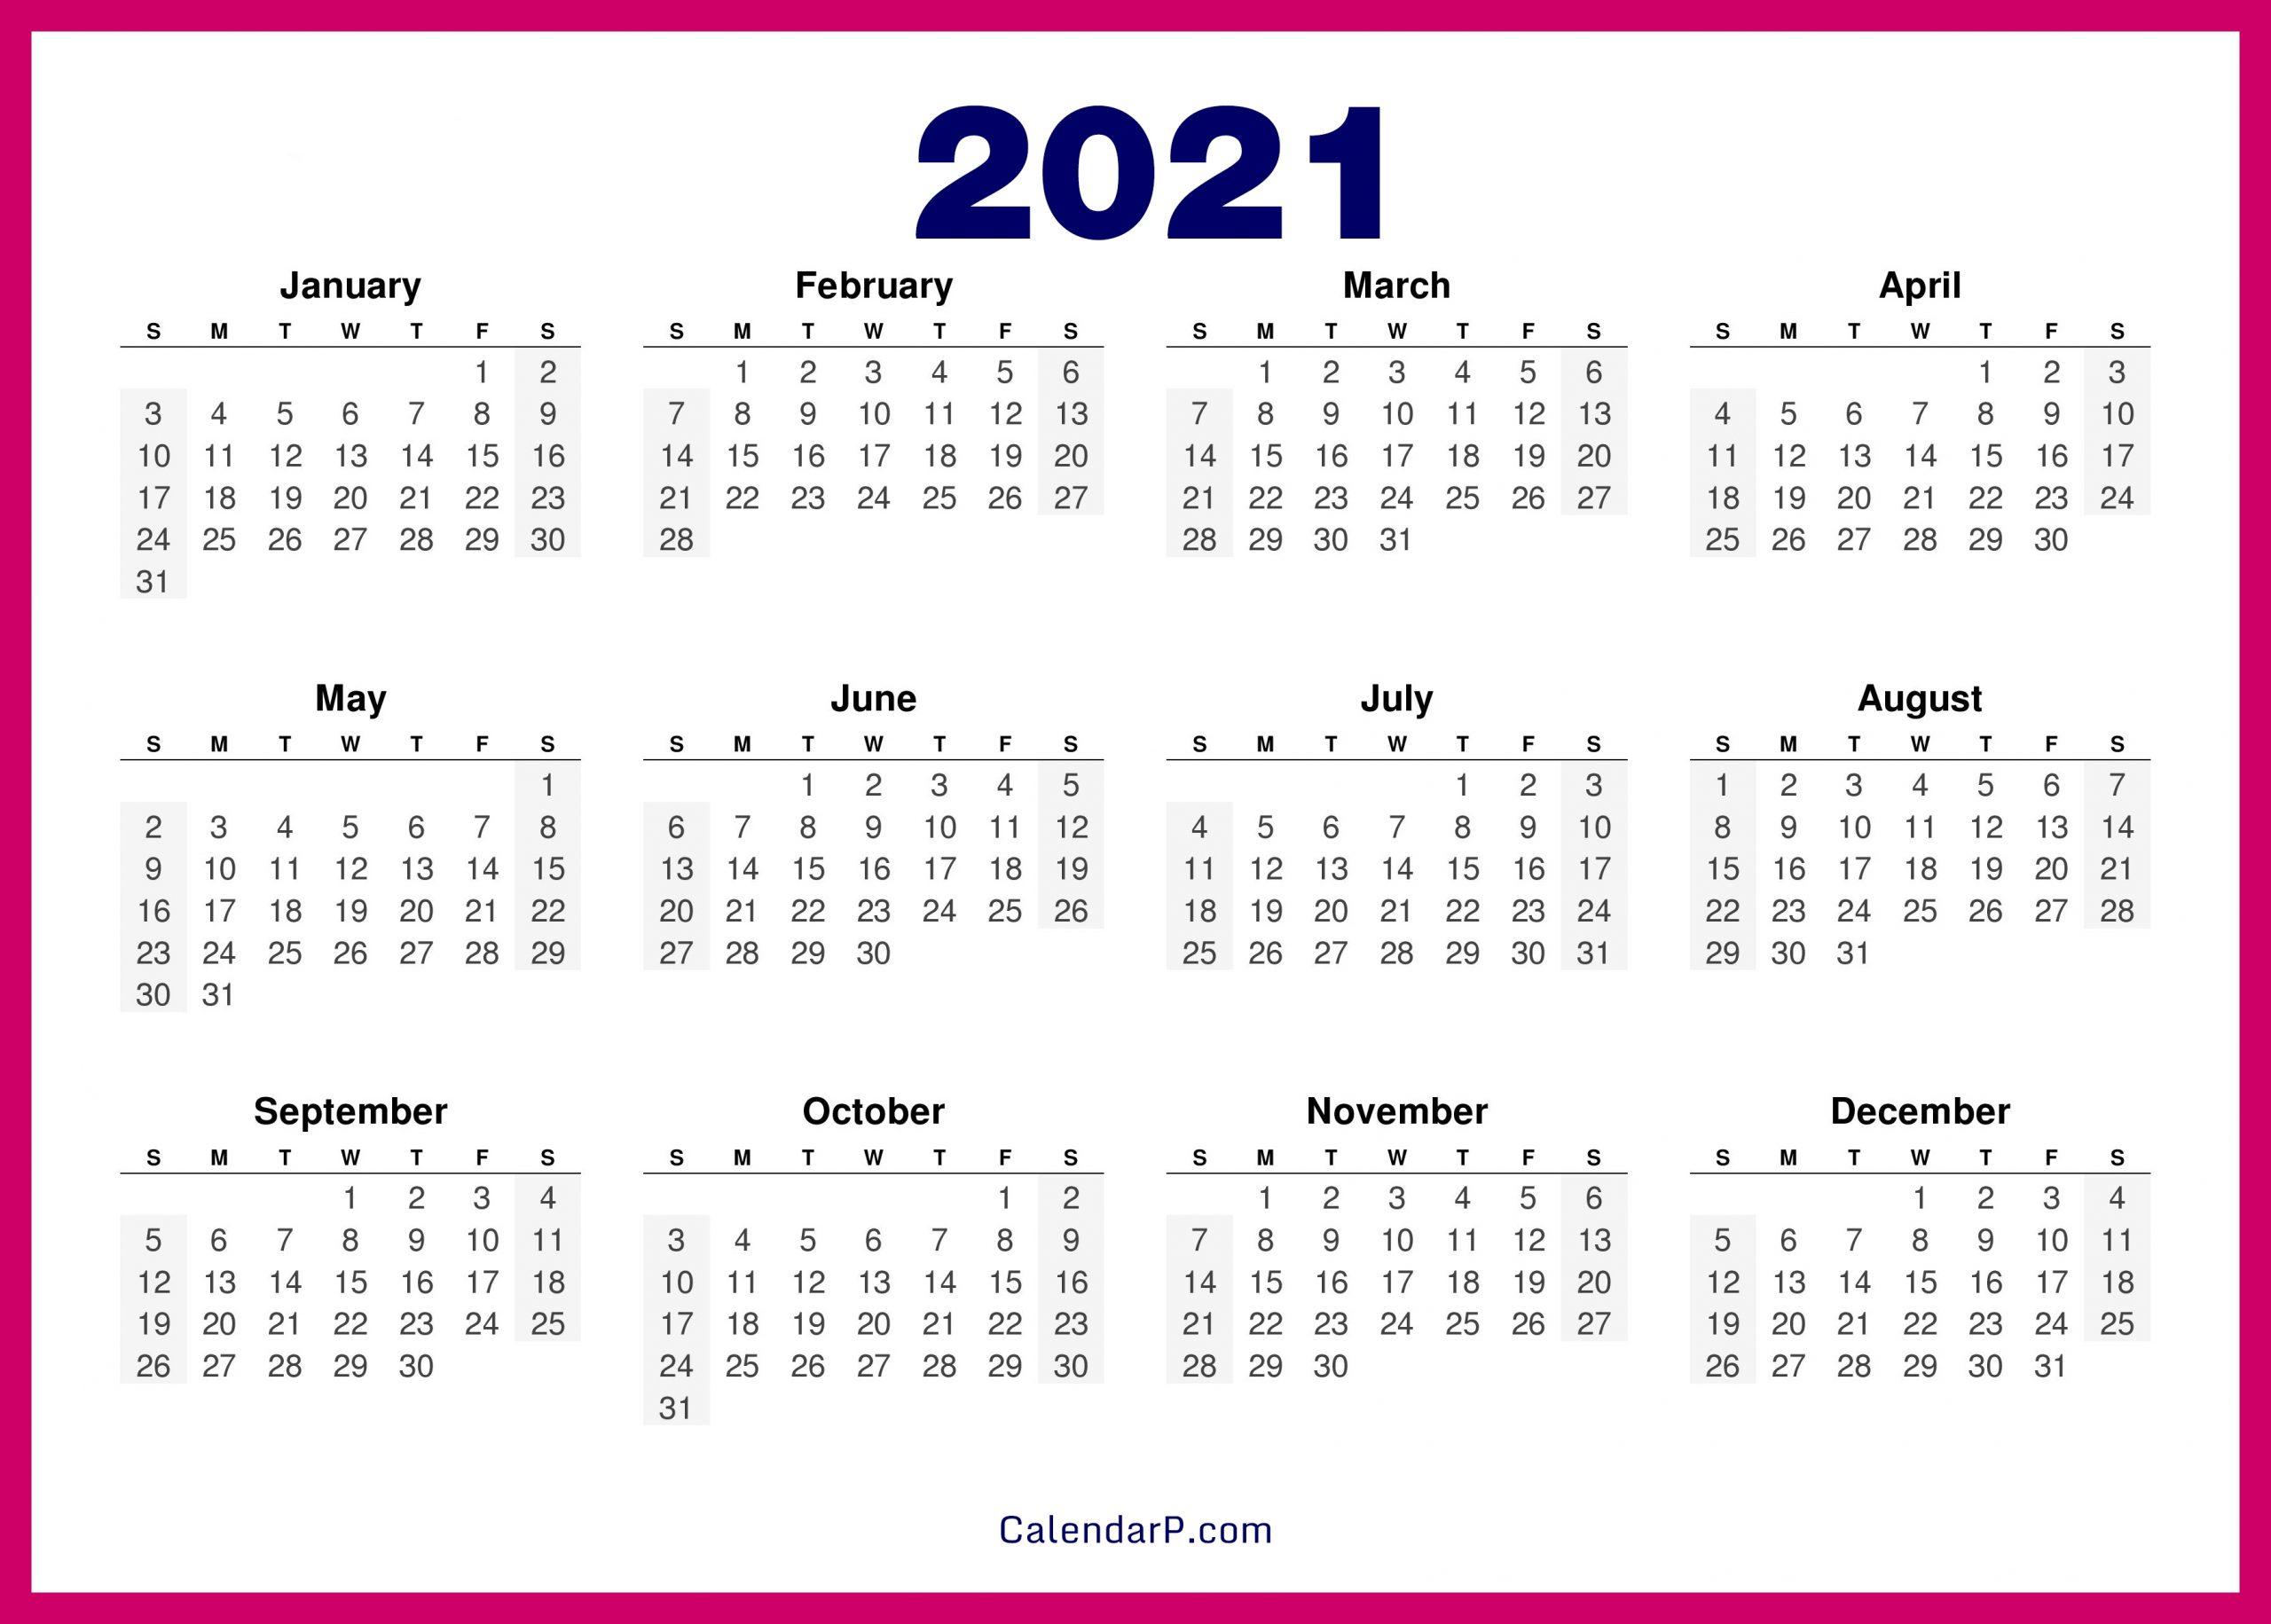 2021 calendar printable free hd pink calendarp printable free calendars::Download 2021 Printable Calendar